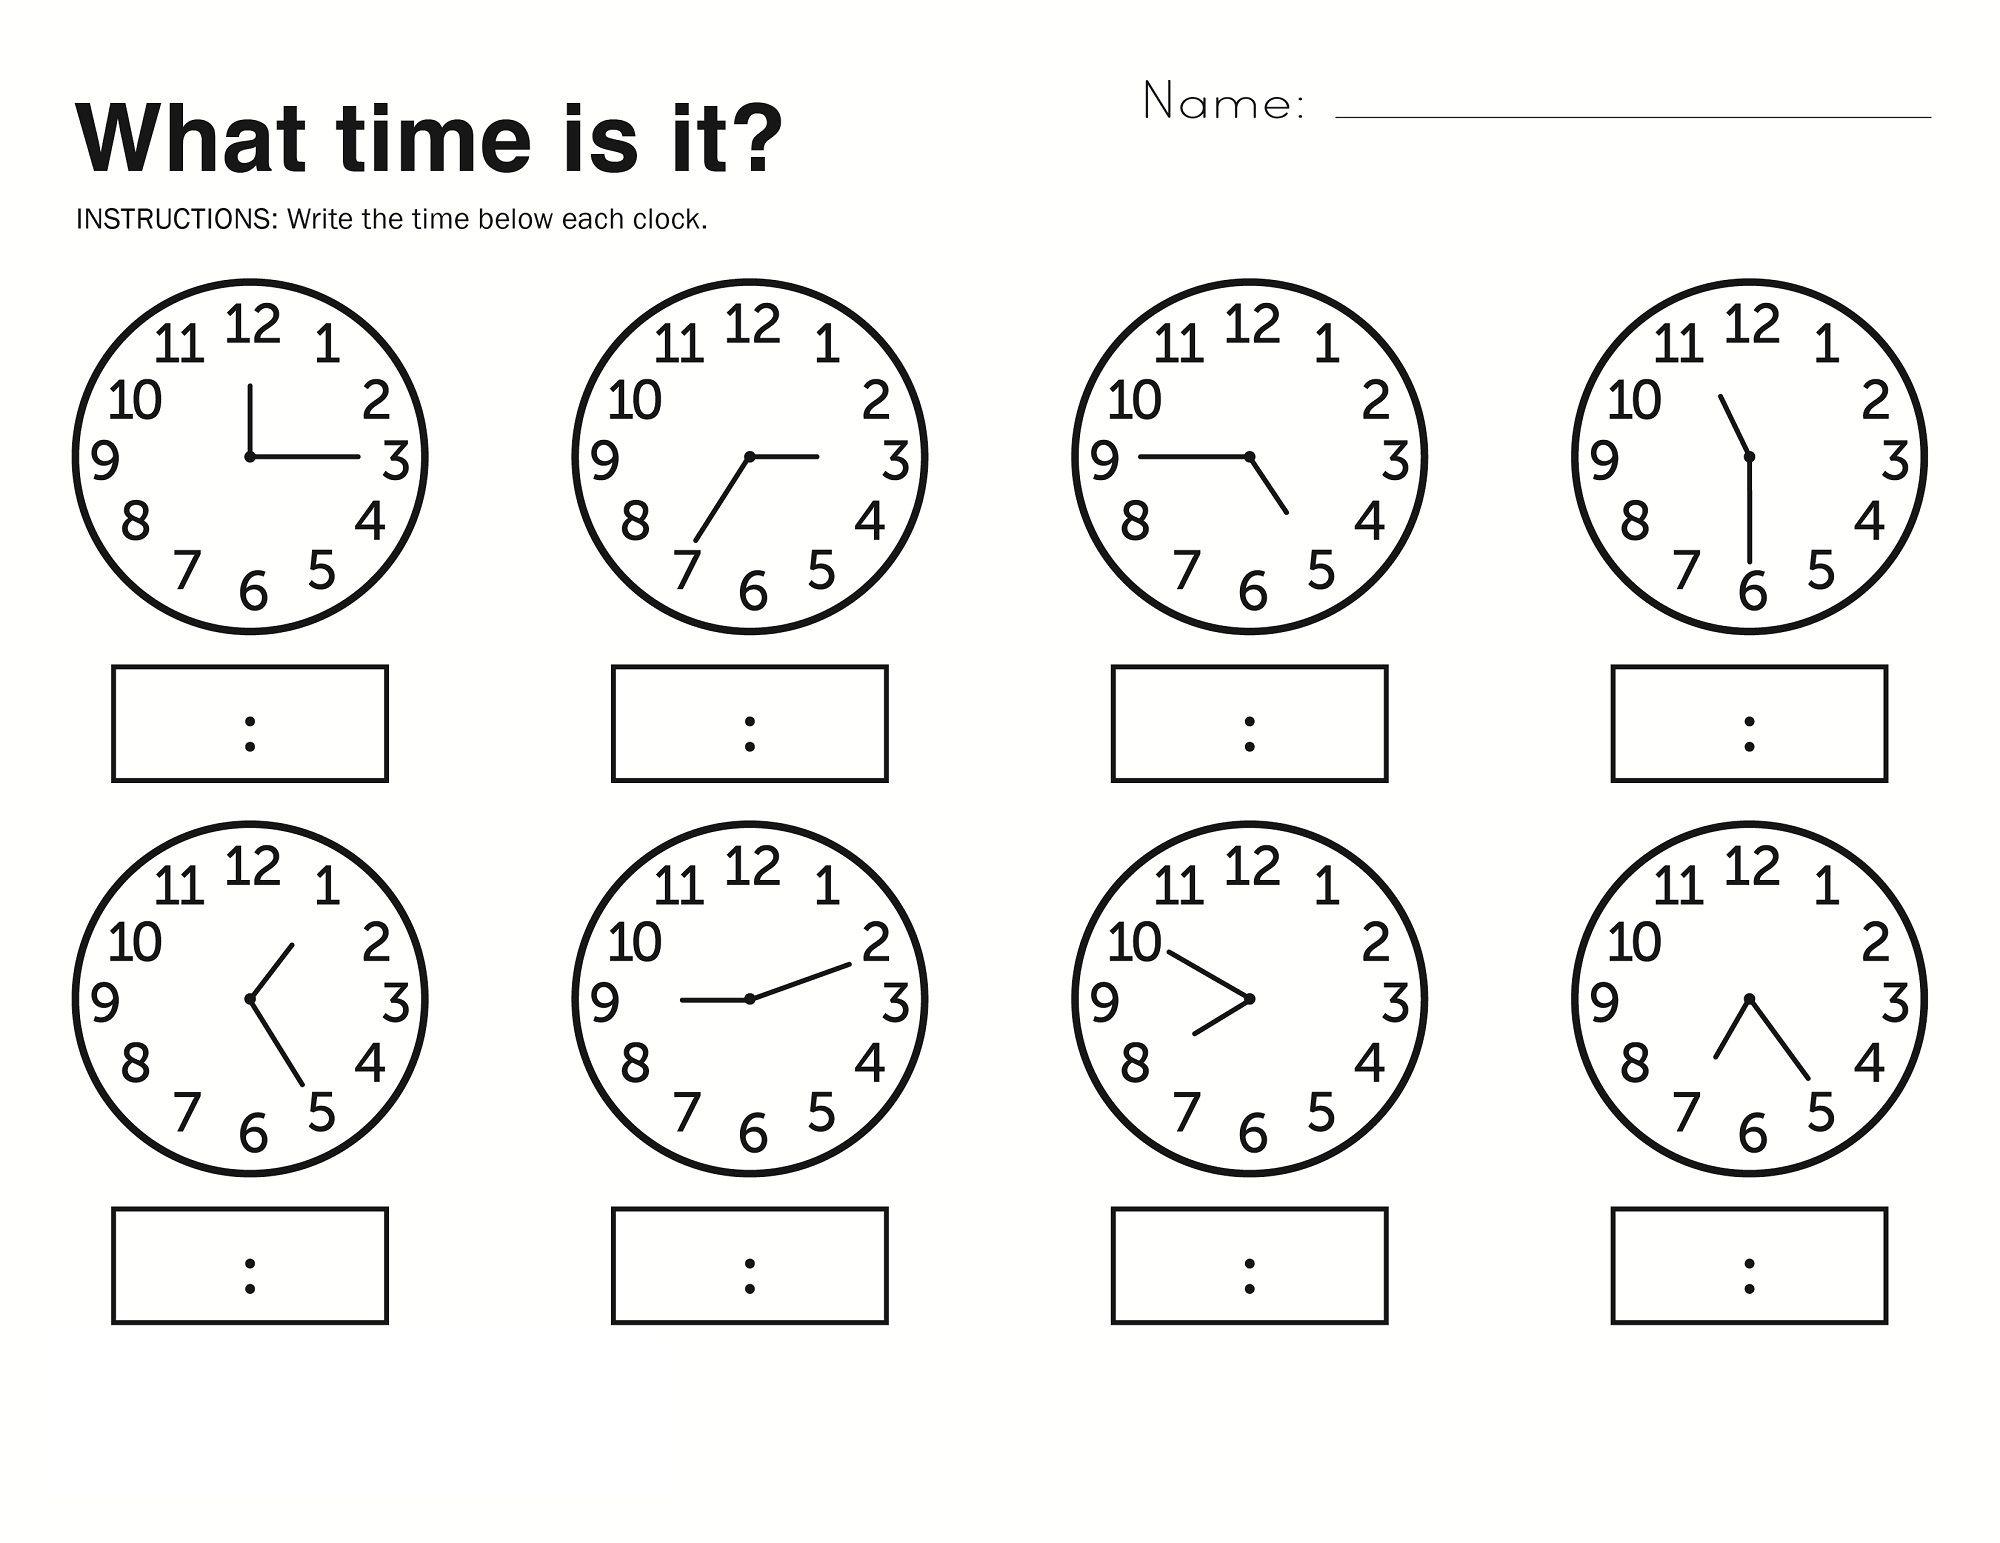 Time Elapsed Worksheets To Print | Math Fun | Free Kindergarten - Elapsed Time Worksheets Free Printable